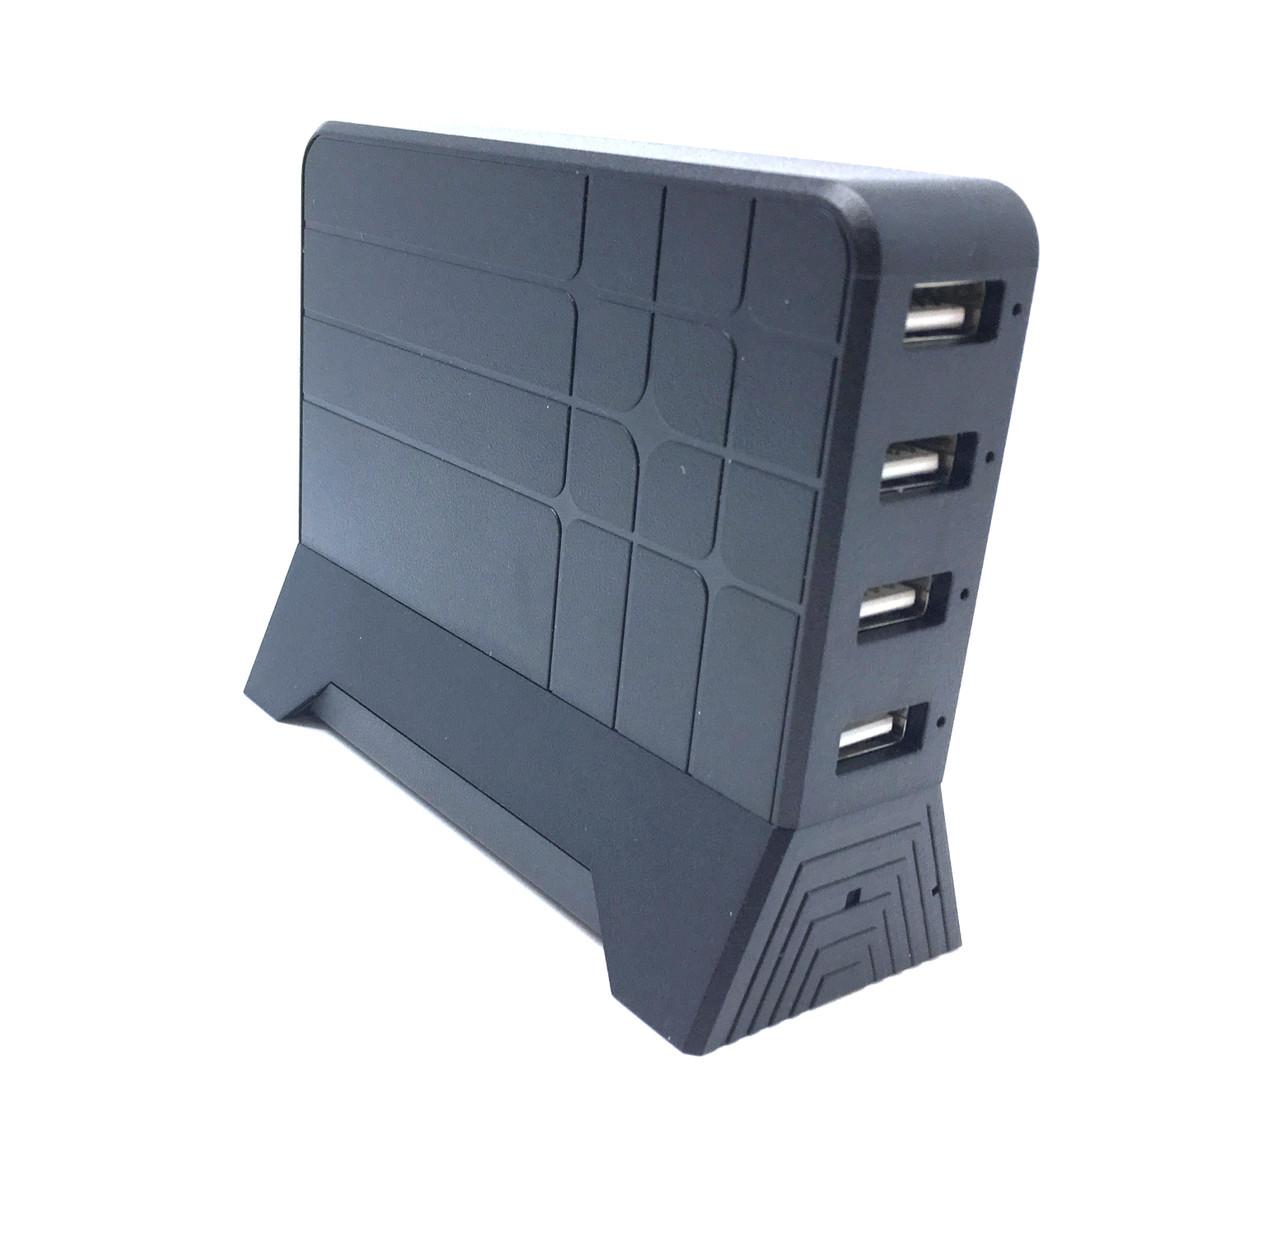 Lawmate PV-CS10i Covert Camera and DVR USB Charging Station usb ports